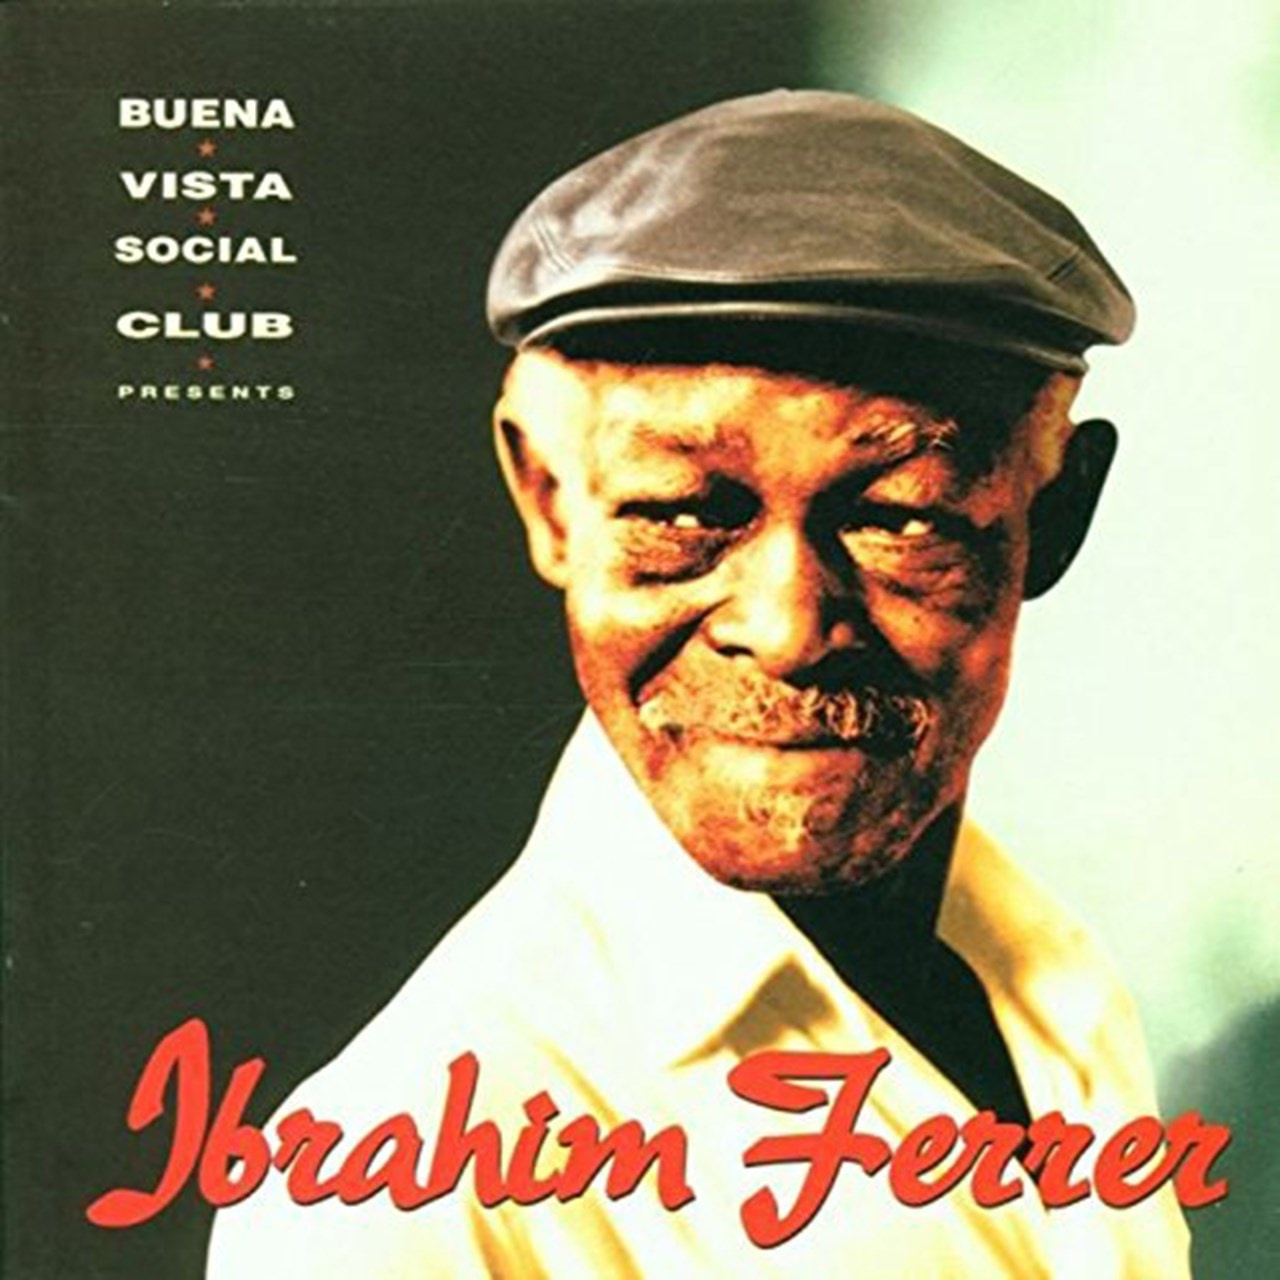 BUENA VISTA SOCIAL CLUB - IBRAHIM FERRER